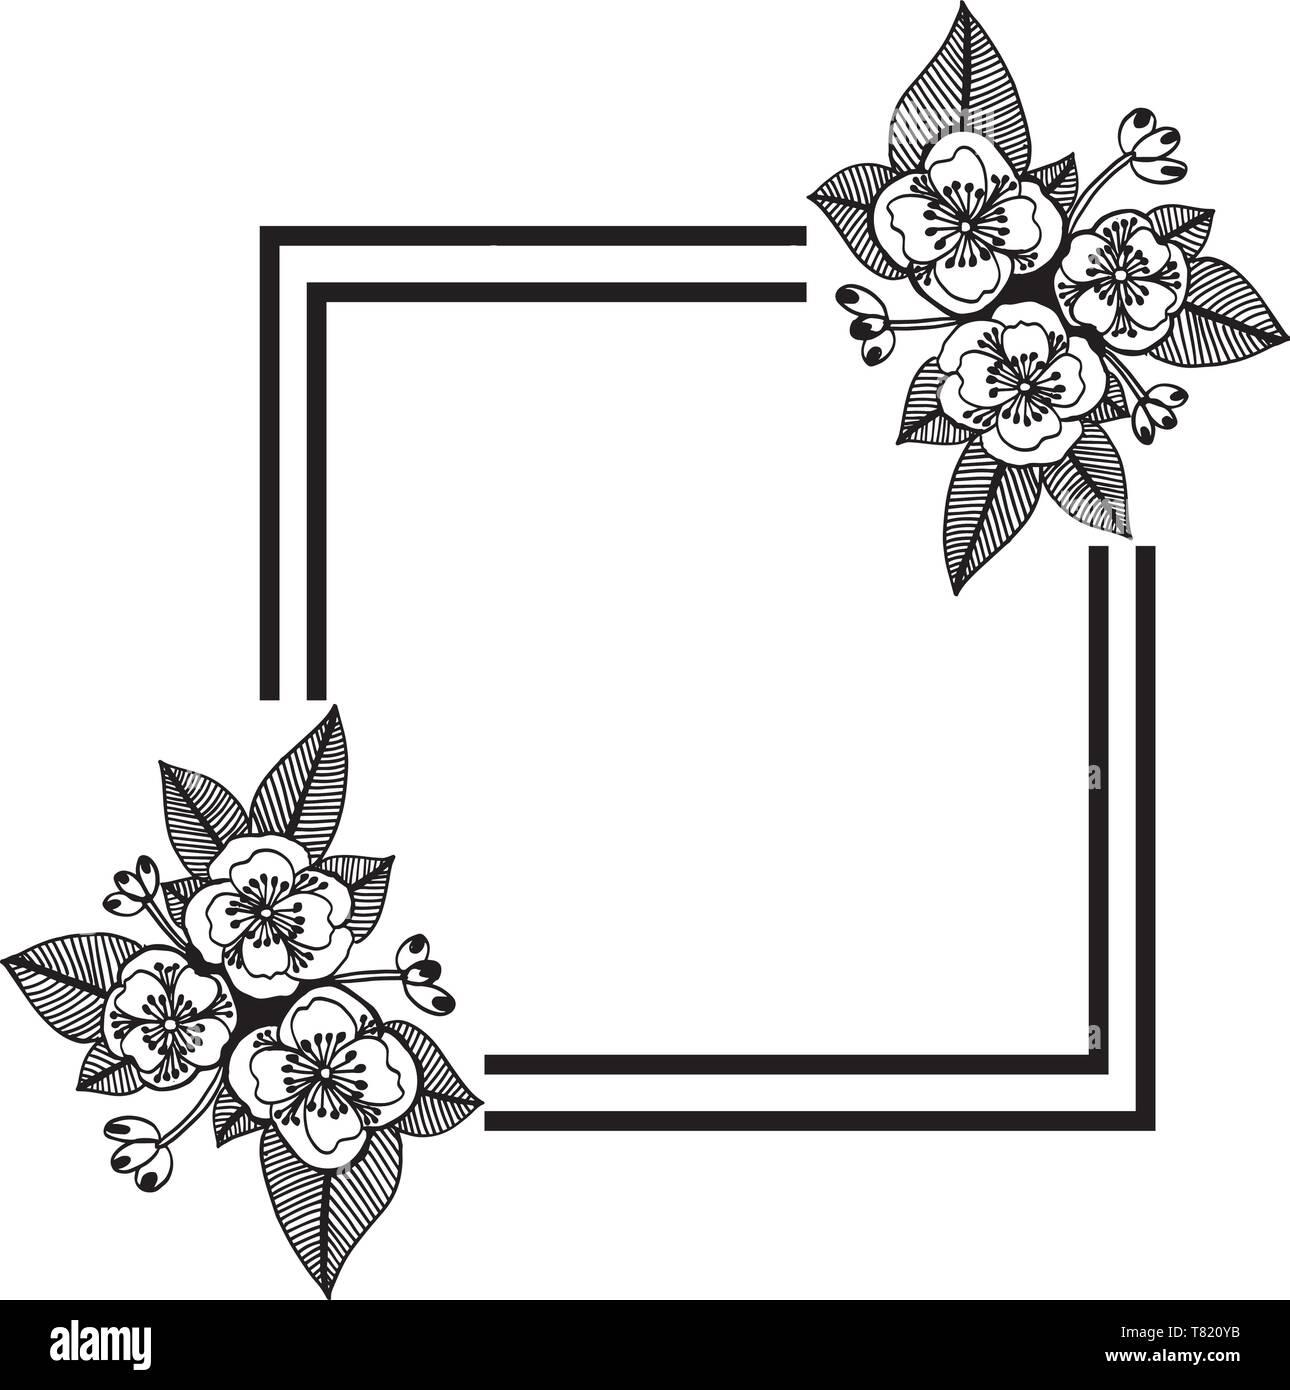 Vector Illustration Drawing Flower Frame For Walpaper Design Of